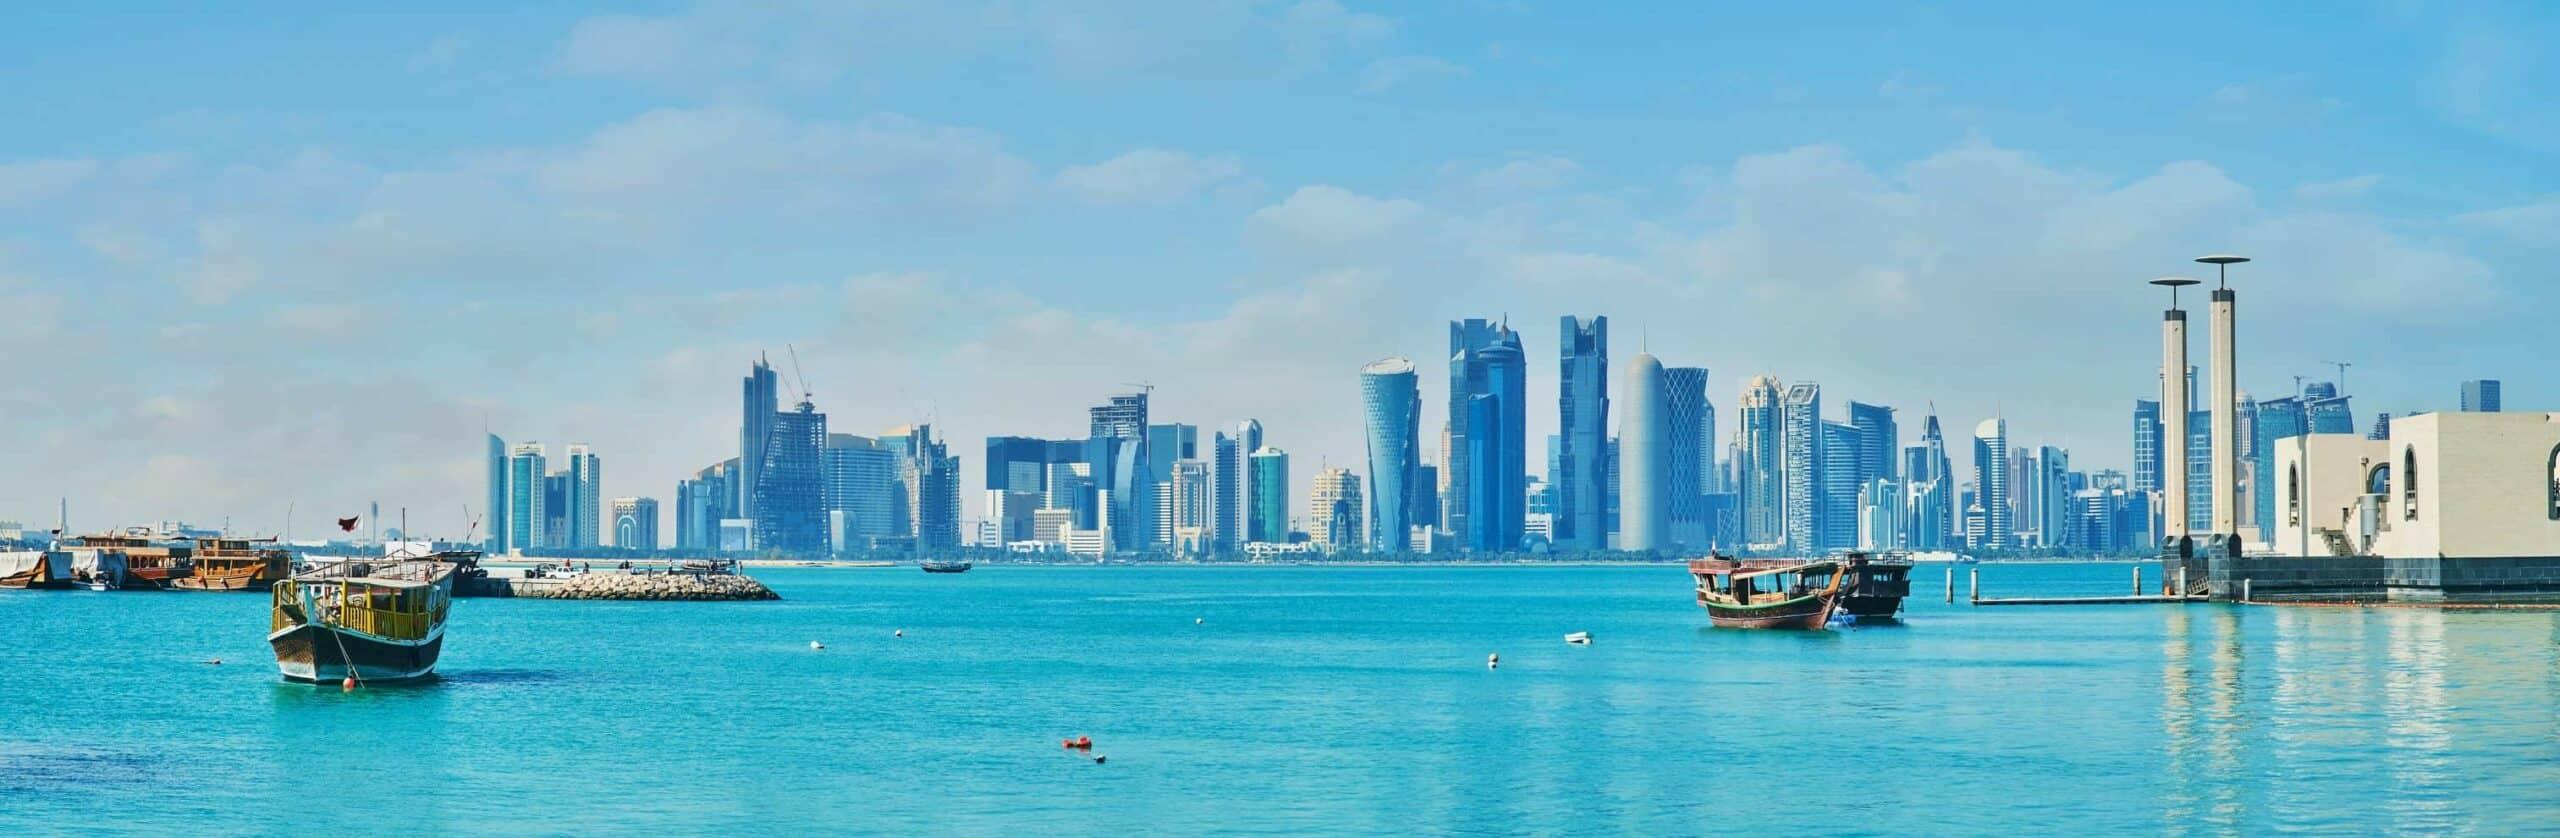 The seaside view on futuristic skyscrapers of West Bay from the Corniche promenade, Doha, Qatar.